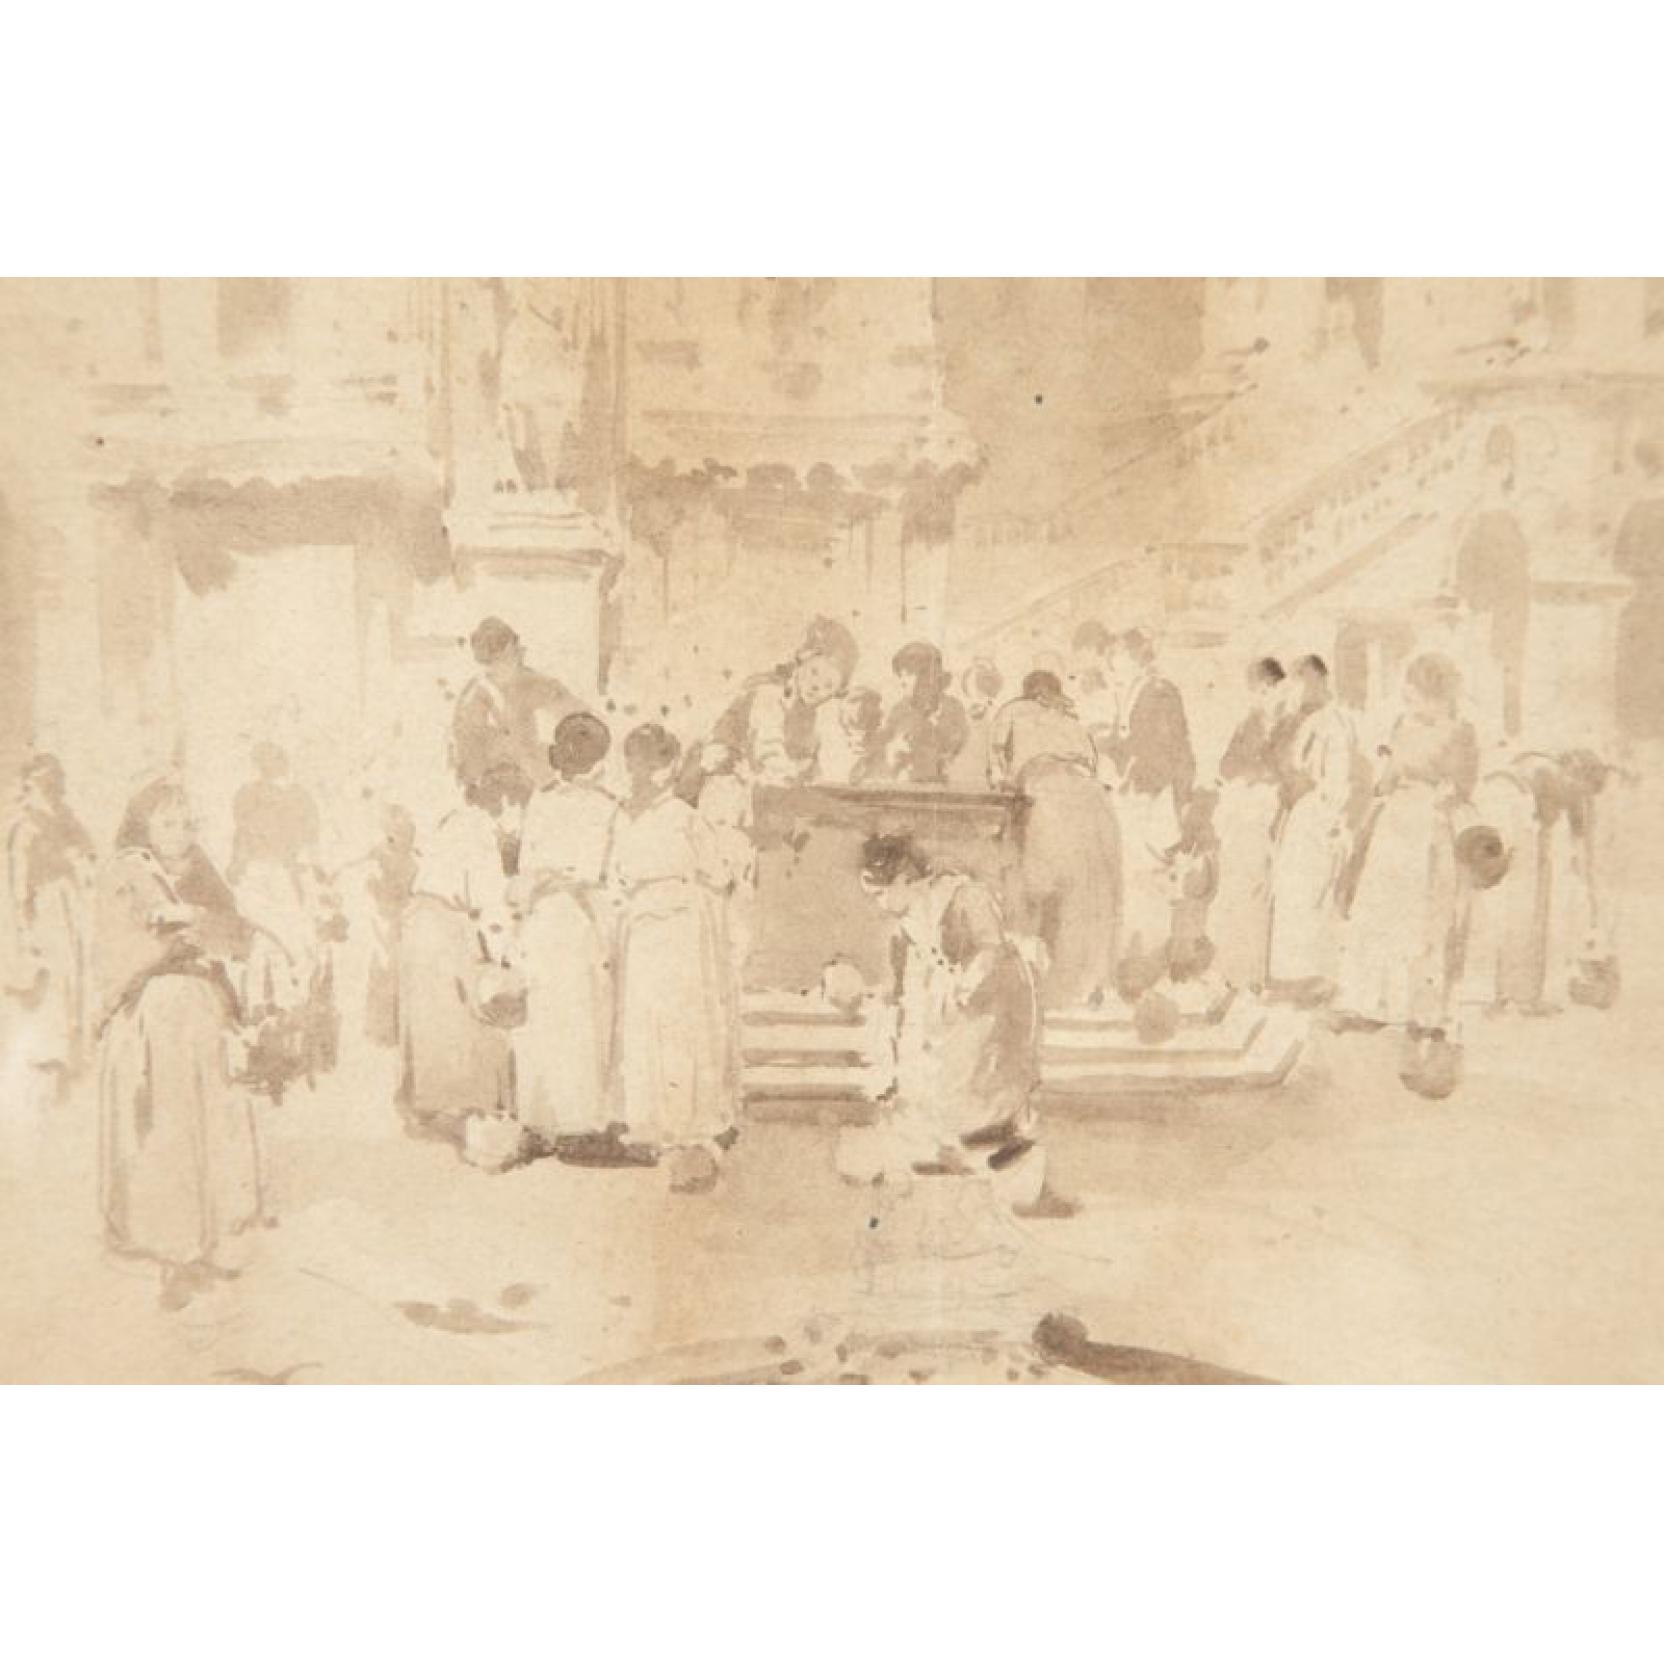 alberto-prosdocimi-it-1852-1925-doge-s-palace